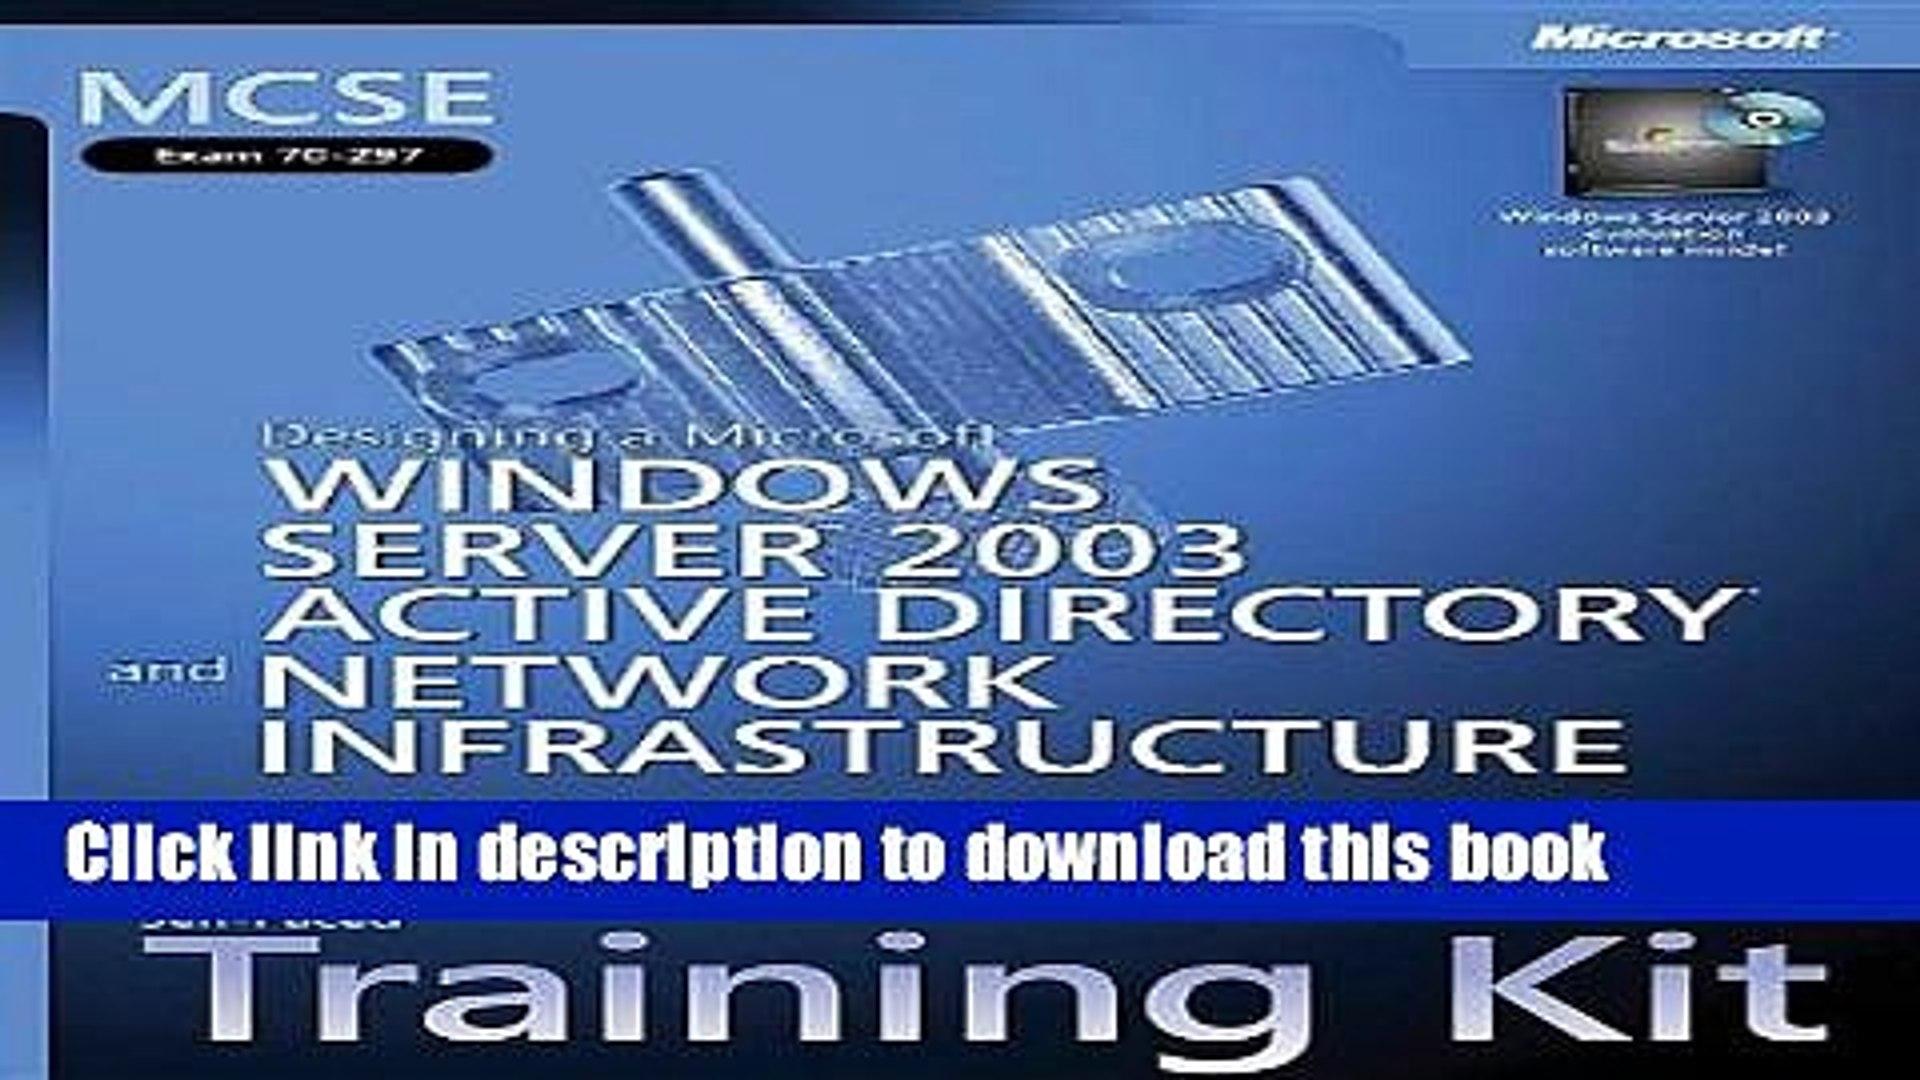 Read MCSE Self-Paced Training Kit (Exam 70-297): Designing a Microsoft® Windows Server™ 2003